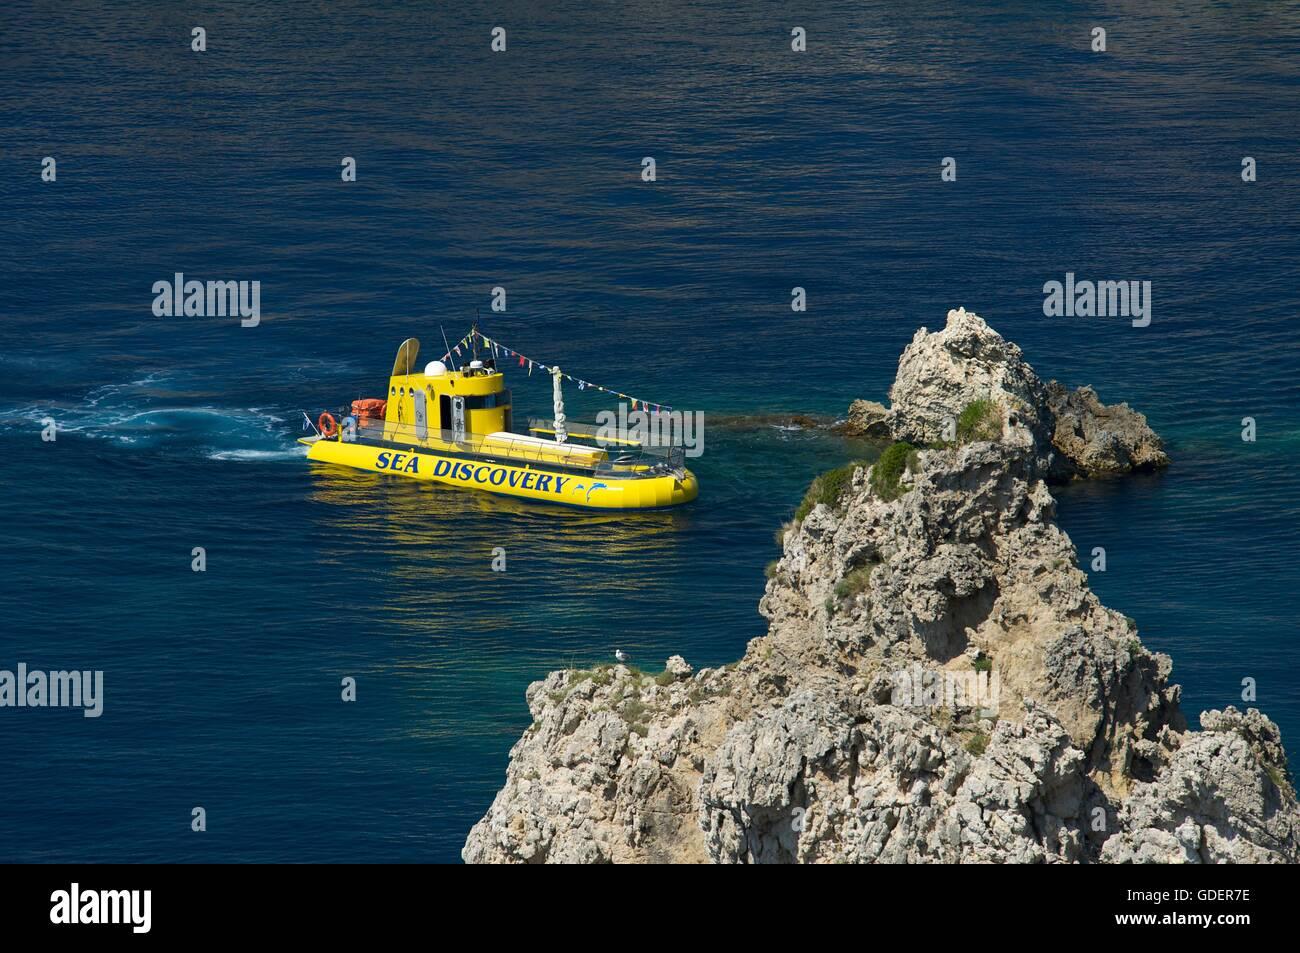 Excursion submarine in tne Bay of Paleokastritsa, Korfu, Corfu, Ionian Islands, Greece - Stock Image